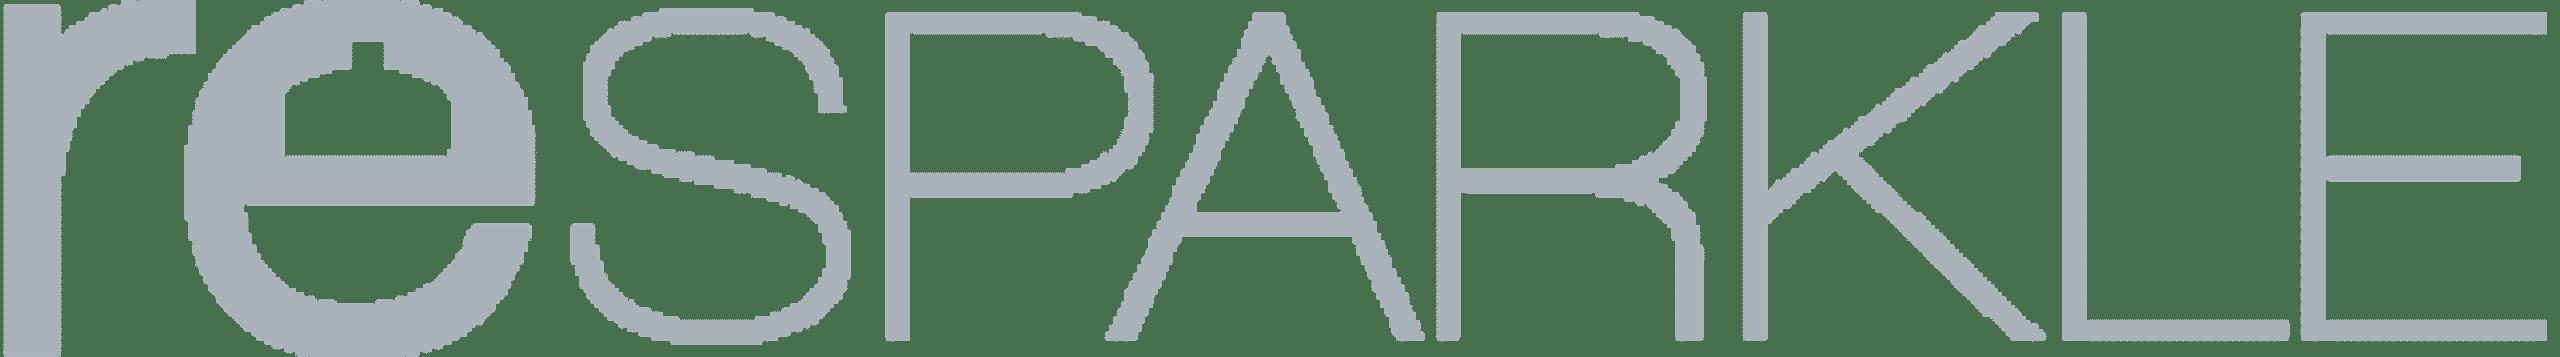 Resparkle Logo